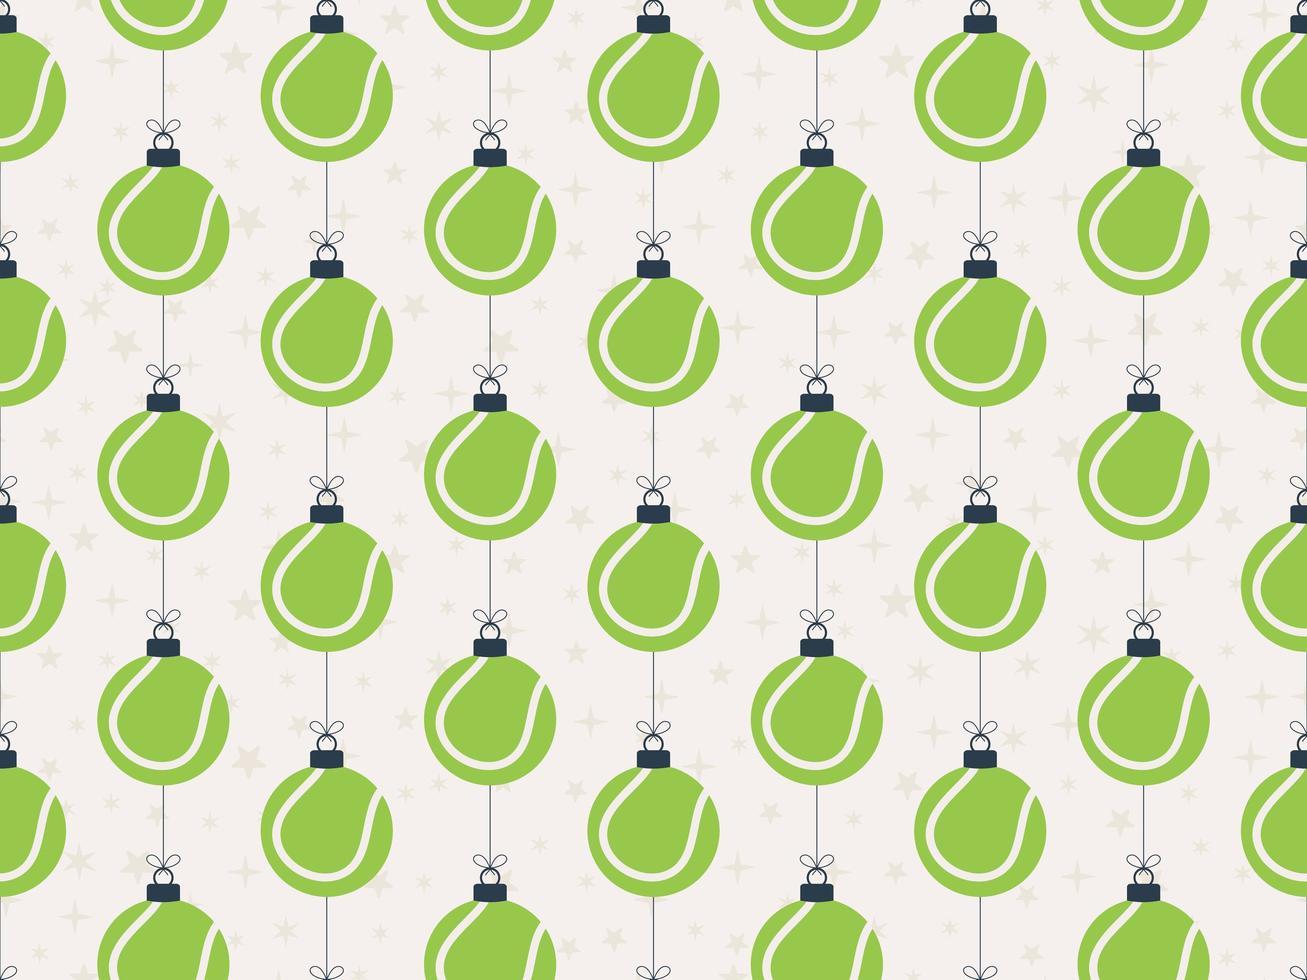 Frohe Weihnachten Tennis nahtlose horizontale Muster vektor